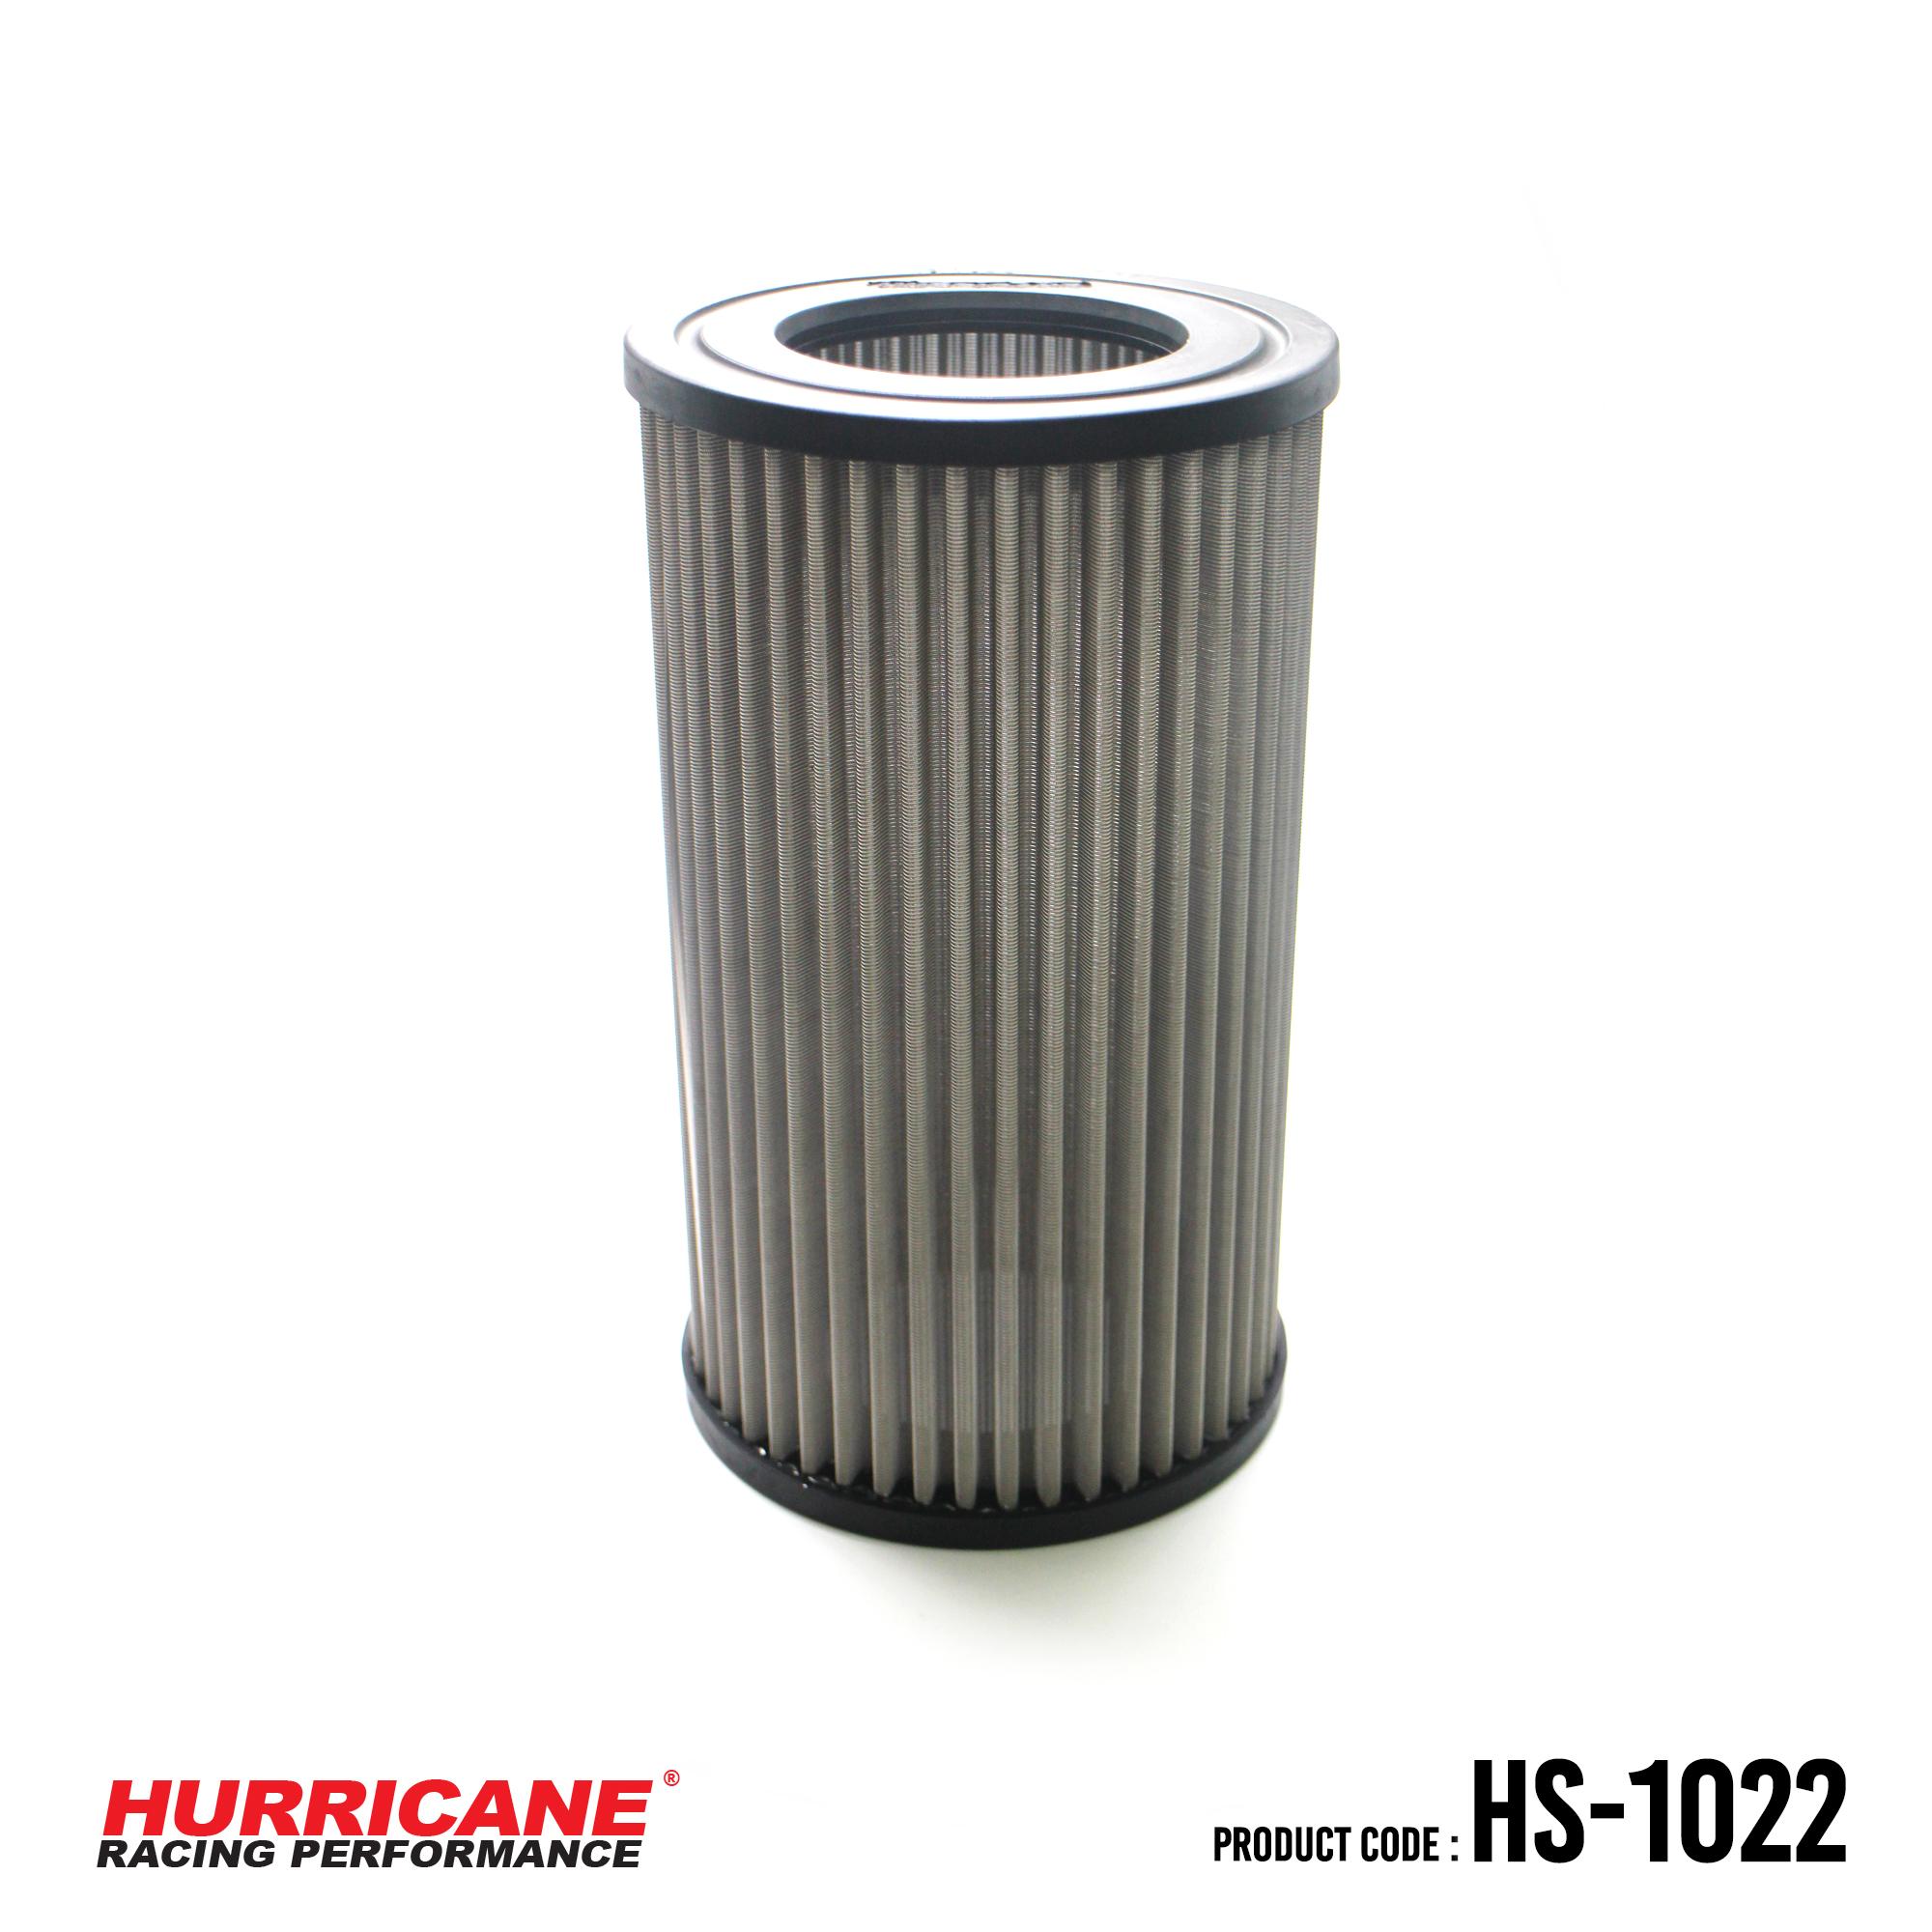 HURRICANE STAINLESS STEEL AIR FILTER FOR HS-1022 Chevrolet